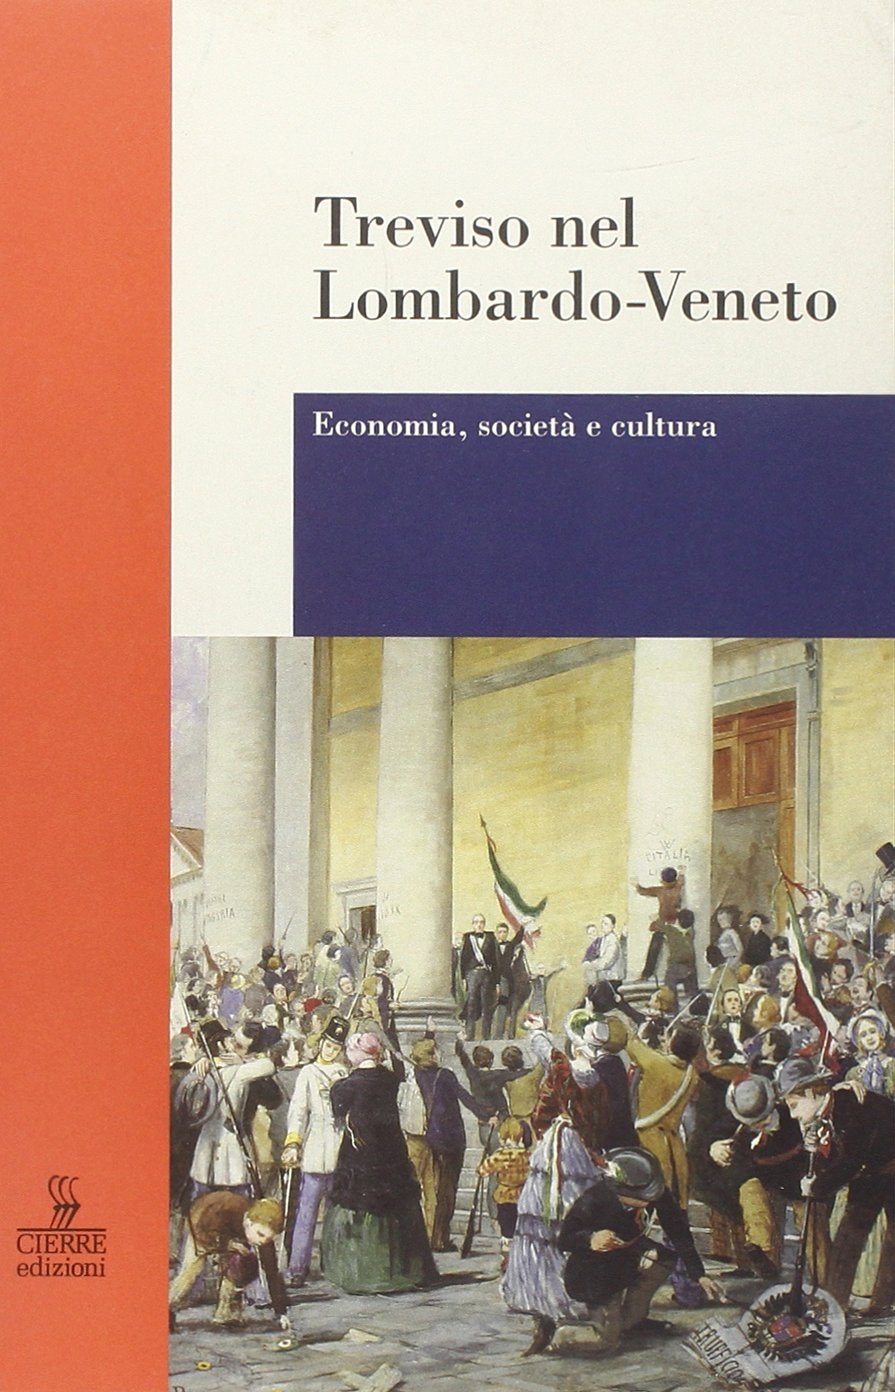 Treviso nel Lombardo-Veneto